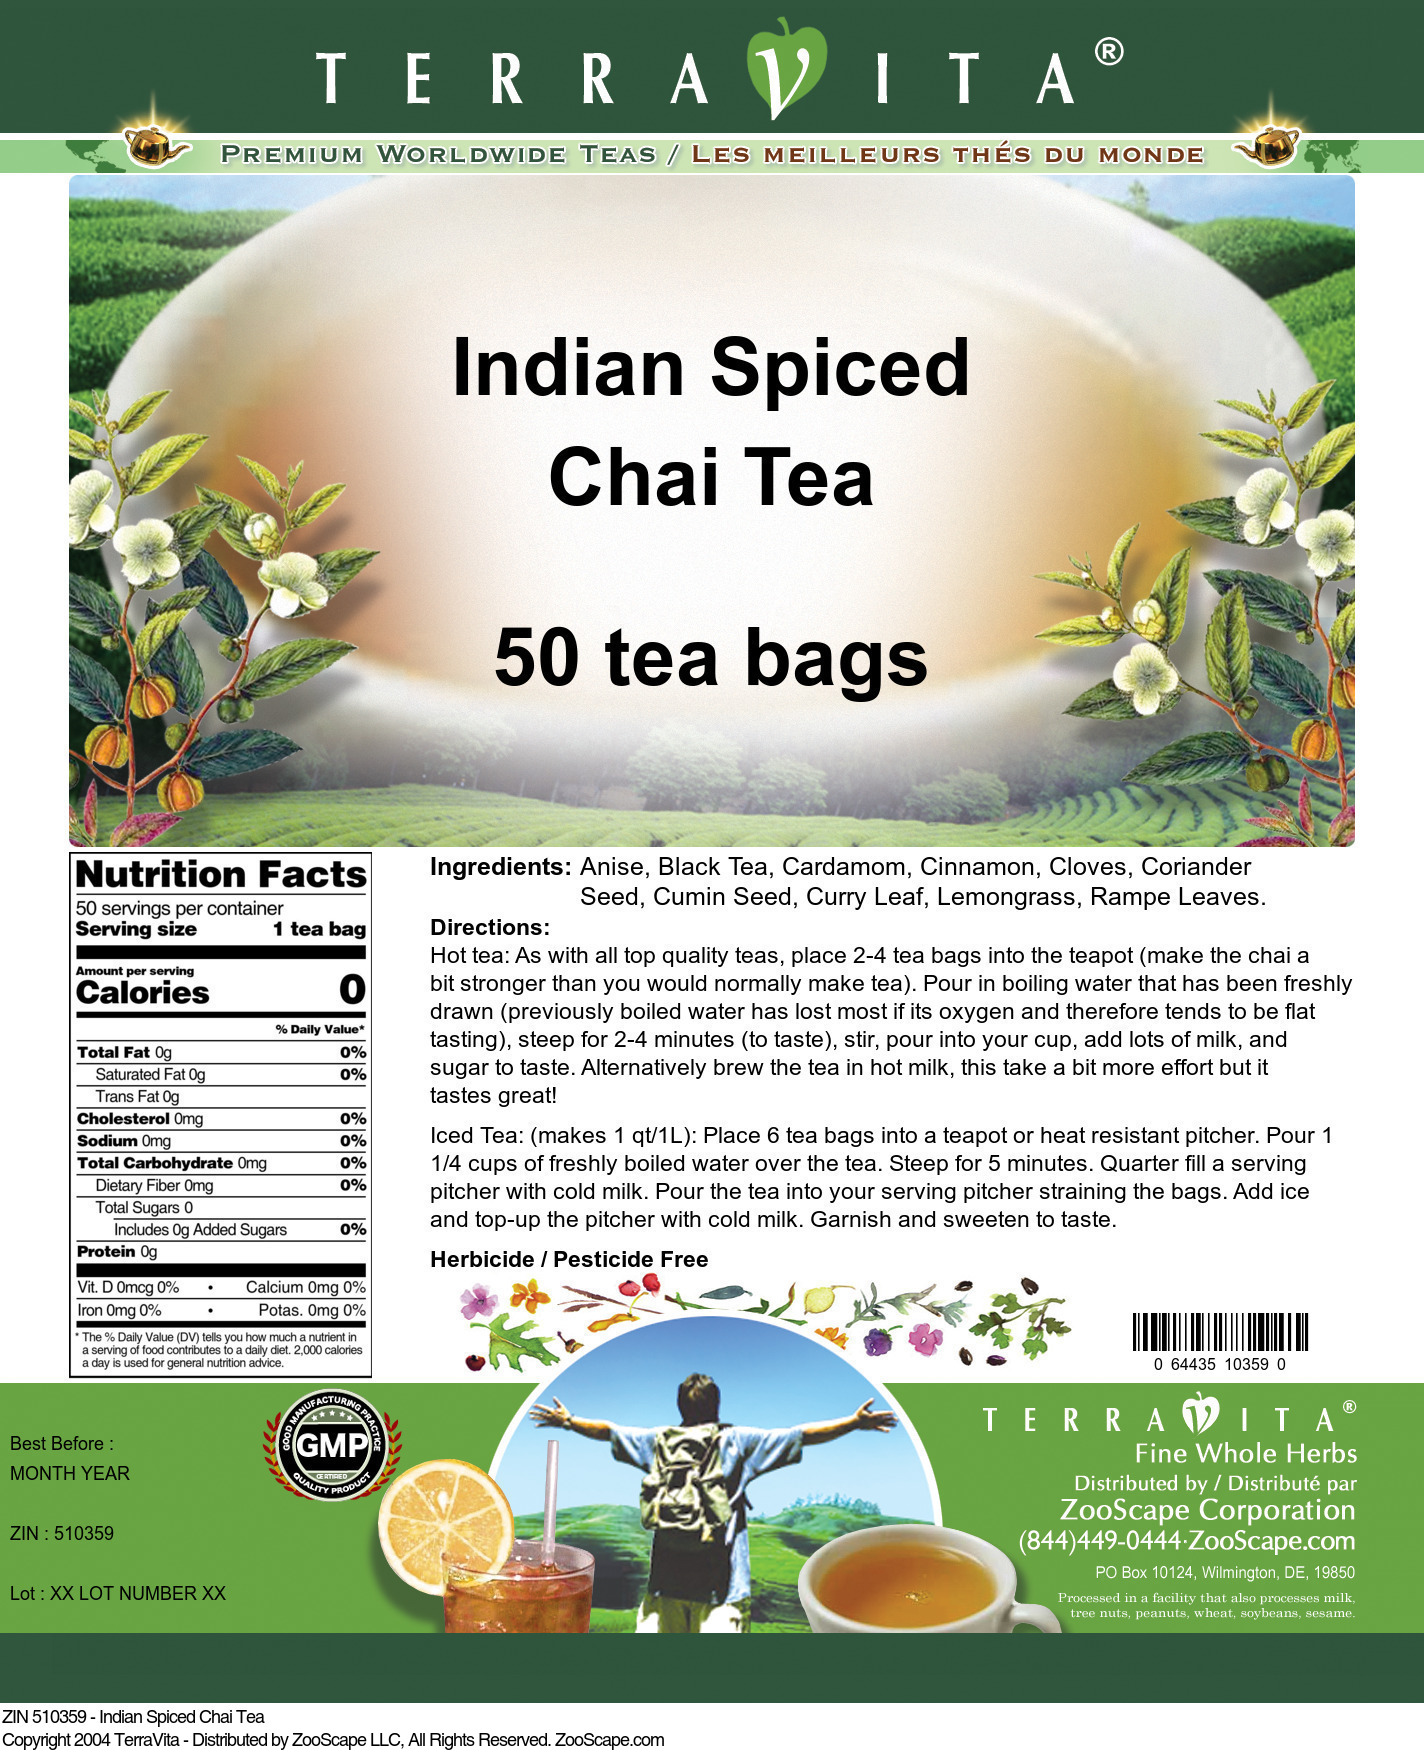 Indian Spiced Chai Tea